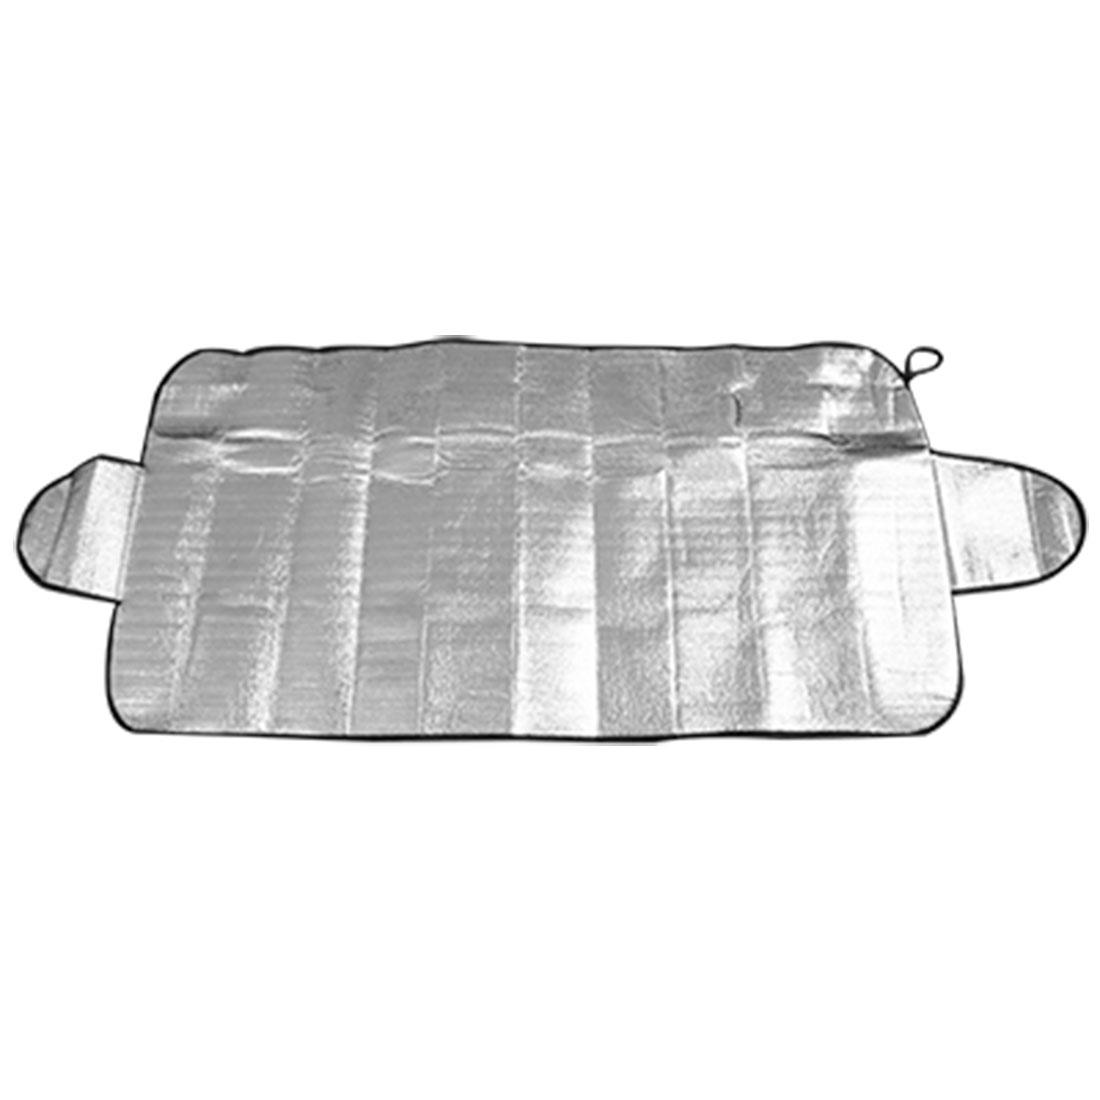 Sliver Tone Aluminum Foil Snow Heat Resistant Auto Car Windshield Sunshade - image 3 of 3